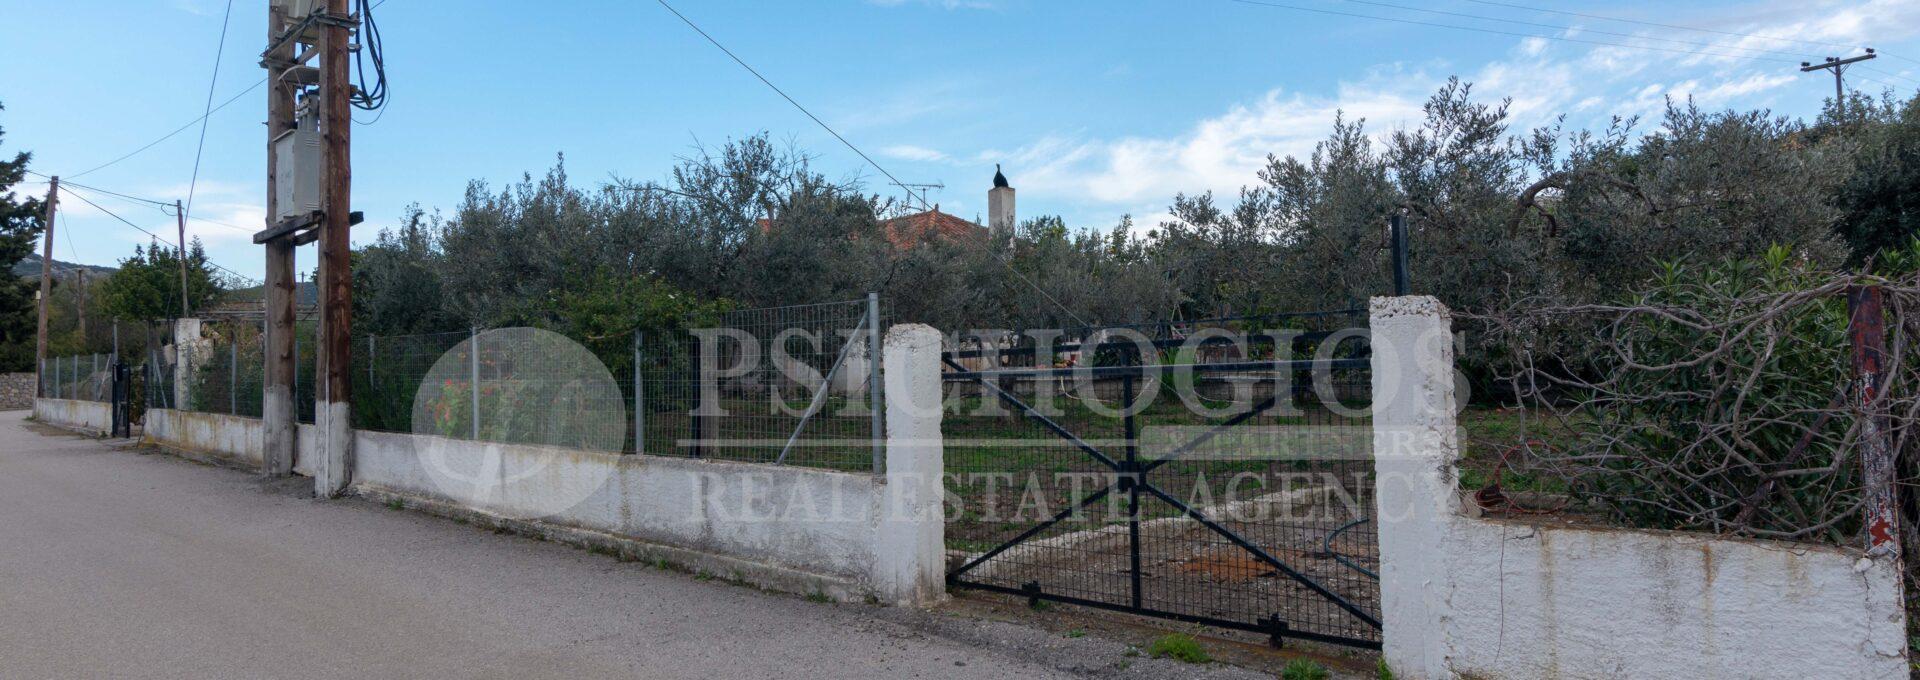 for_sale_two_houses_plot_2000_sq.m._view_ermioni_greece 1 (14)